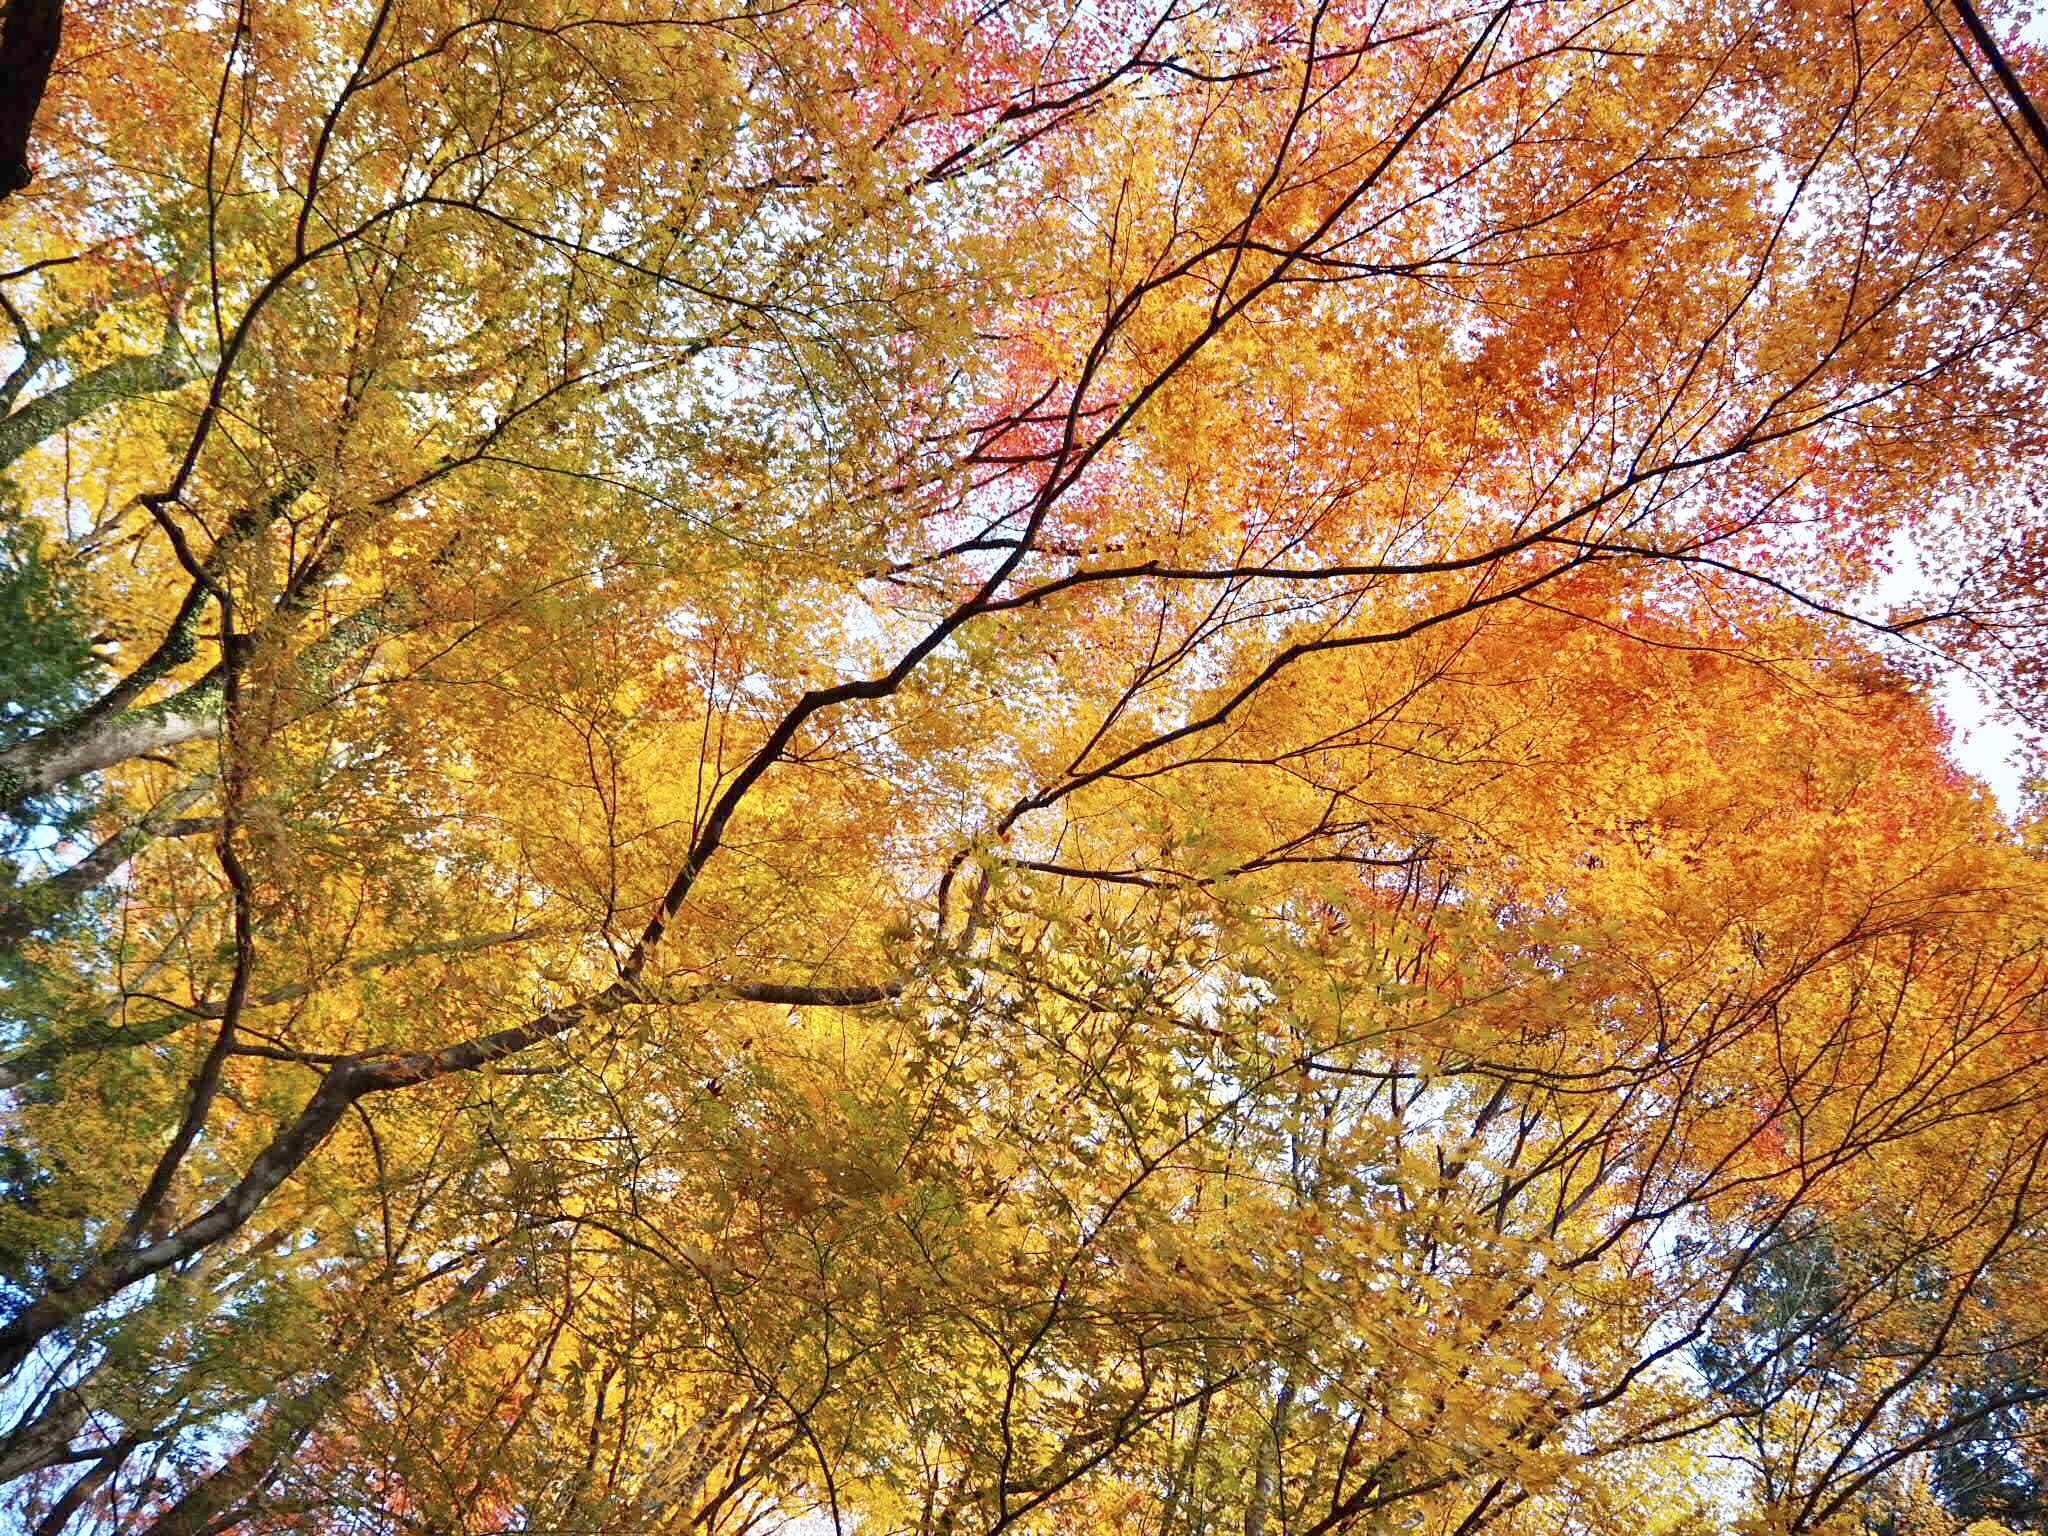 img 7473 - 香嵐渓 - 日本の秋を感じる 愛知県豊田市の紅葉スポット